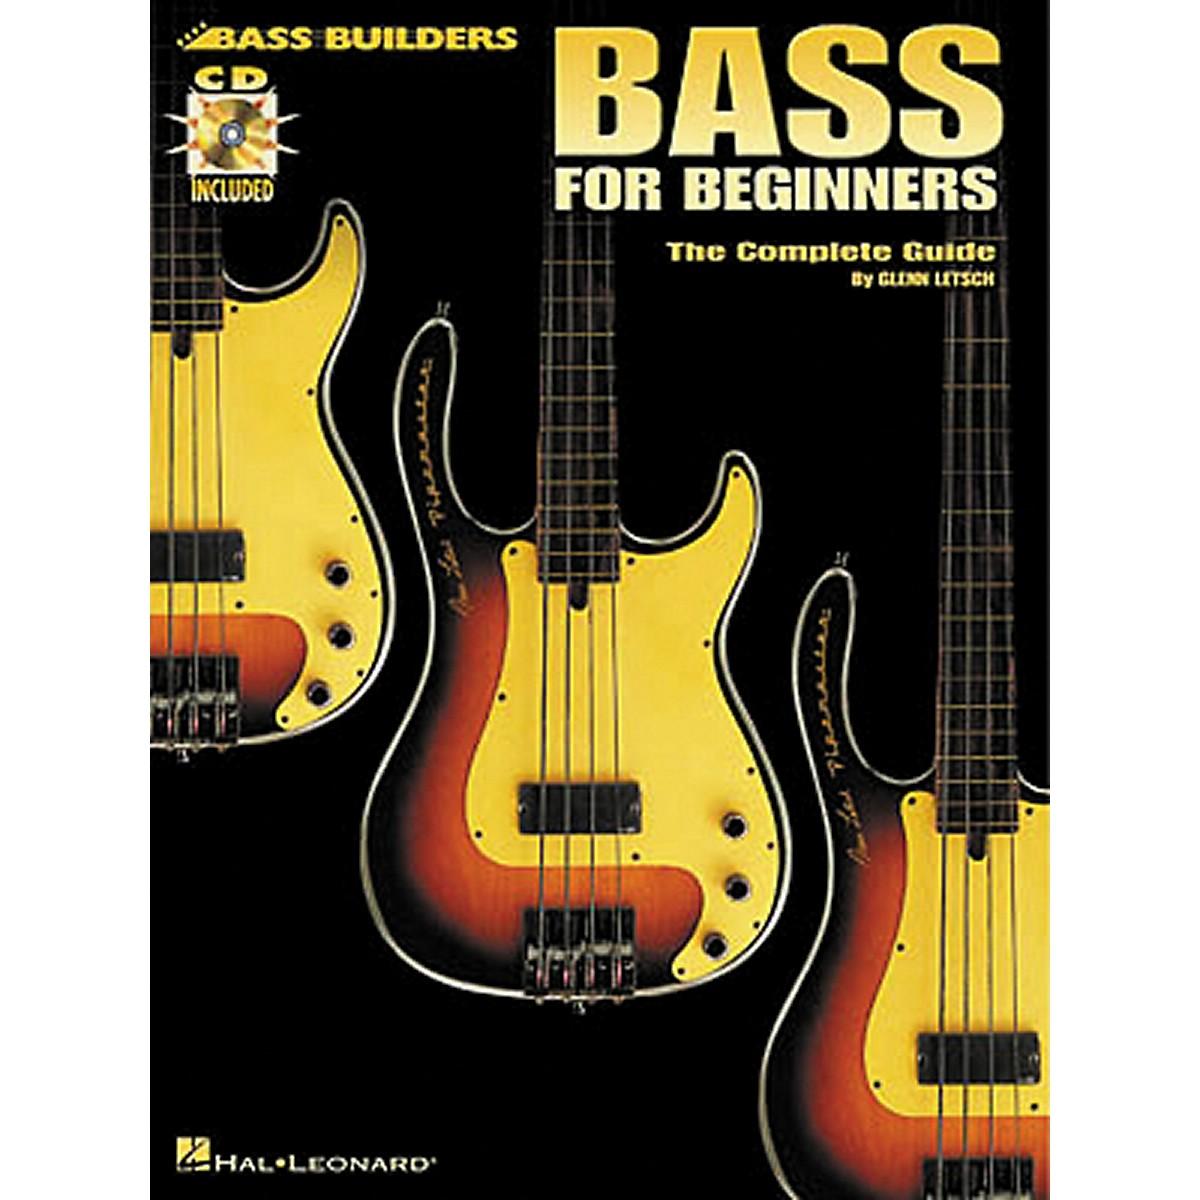 Hal Leonard Bass for Beginners